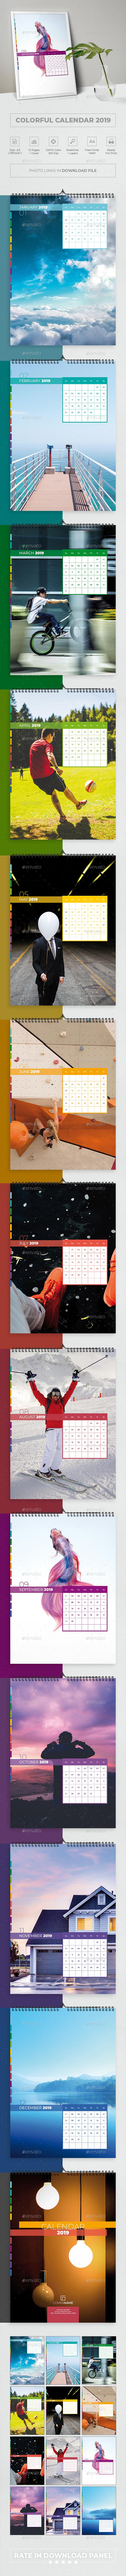 Colorful Calendar 2019 - Calendars Stationery